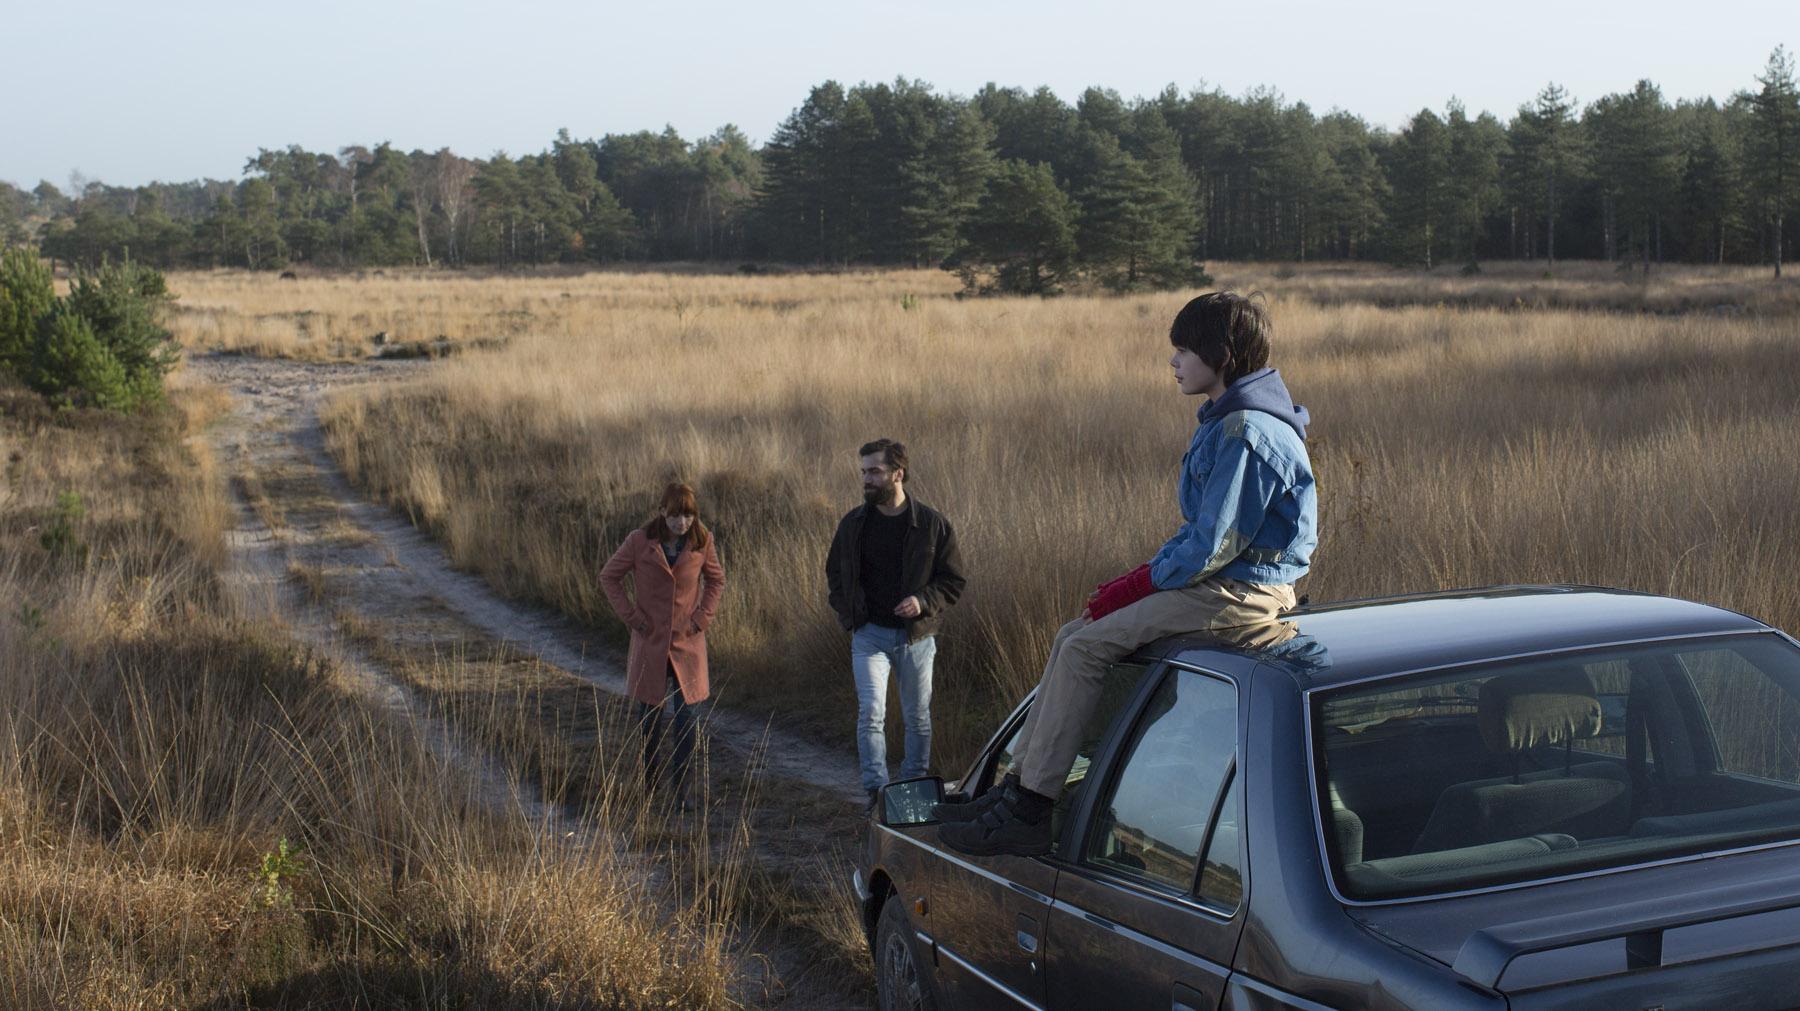 Kimmy Ligtvoet, Steven Michel & Leonard Van Iseghem in L' INFINI directed by Lukas Dhont (KASK 2012) - DoP Rik Zang